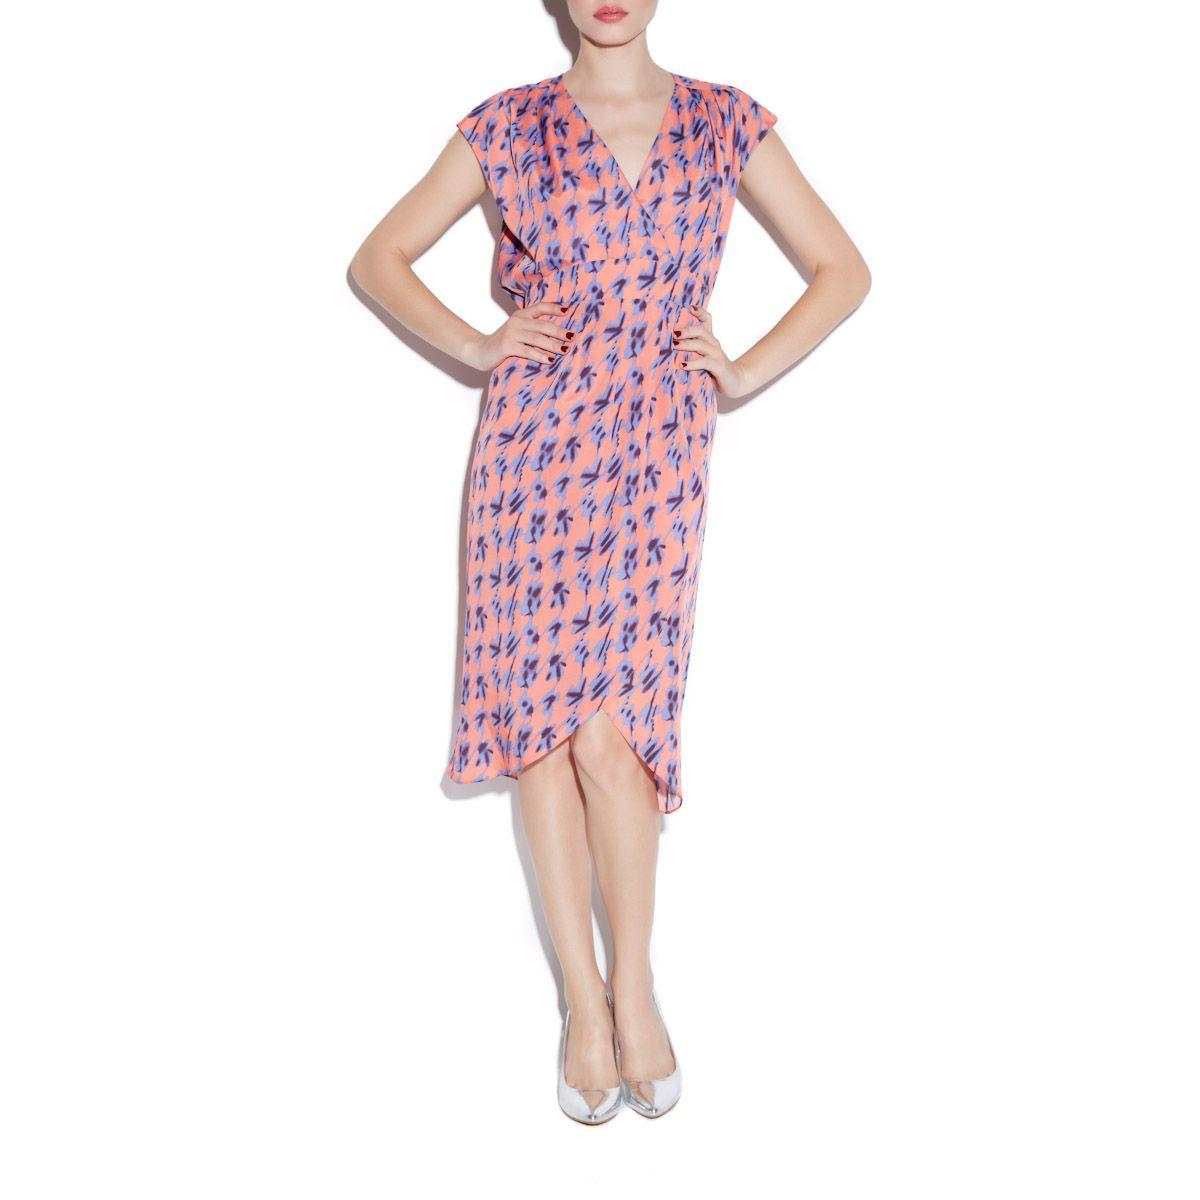 petunia dress | Just My Style | Pinterest